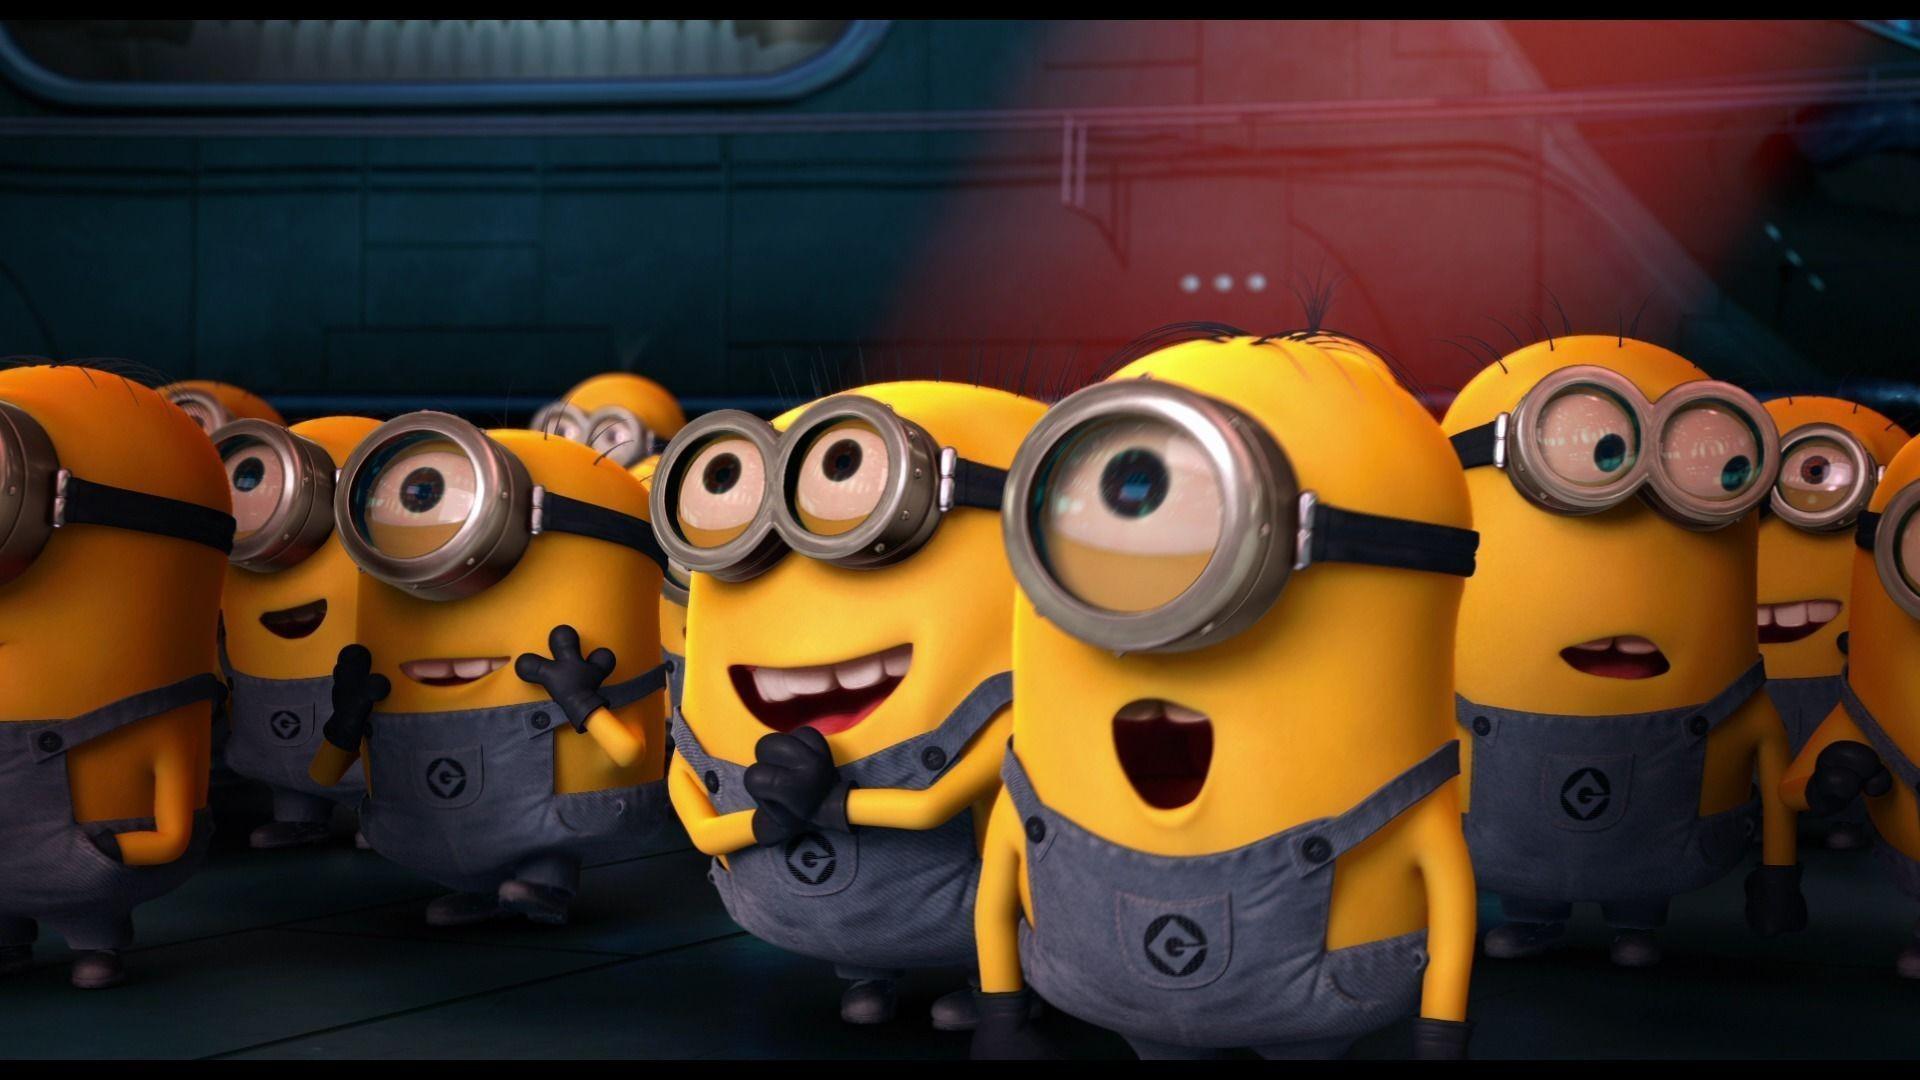 despicable-me-minions-wallpaper-wallpaper-minion -pictures-despicable-bergerak-agnes-hd-banana-minions-despicable-me-minions -cartoon-hd-wallpaper-1920×1080- …